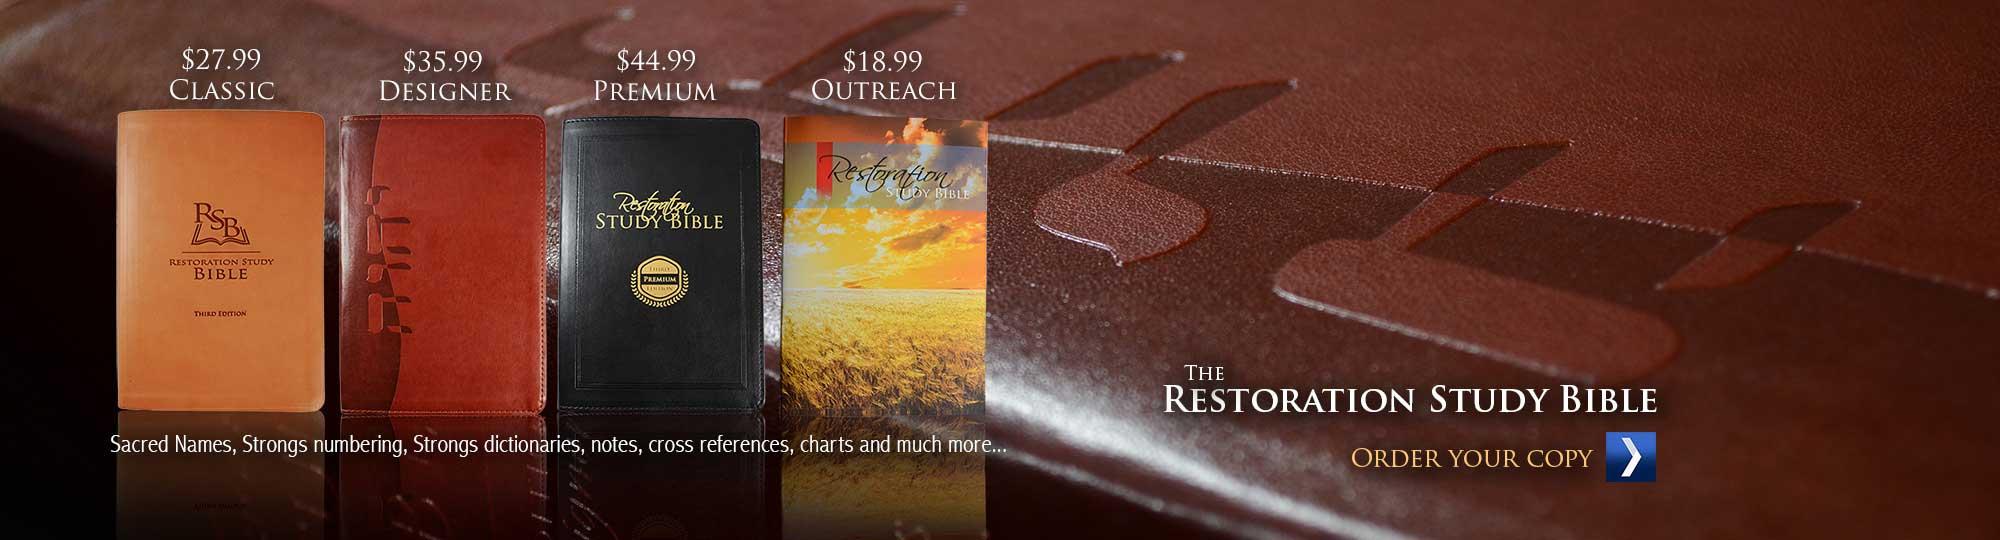 Restoration Study Bible